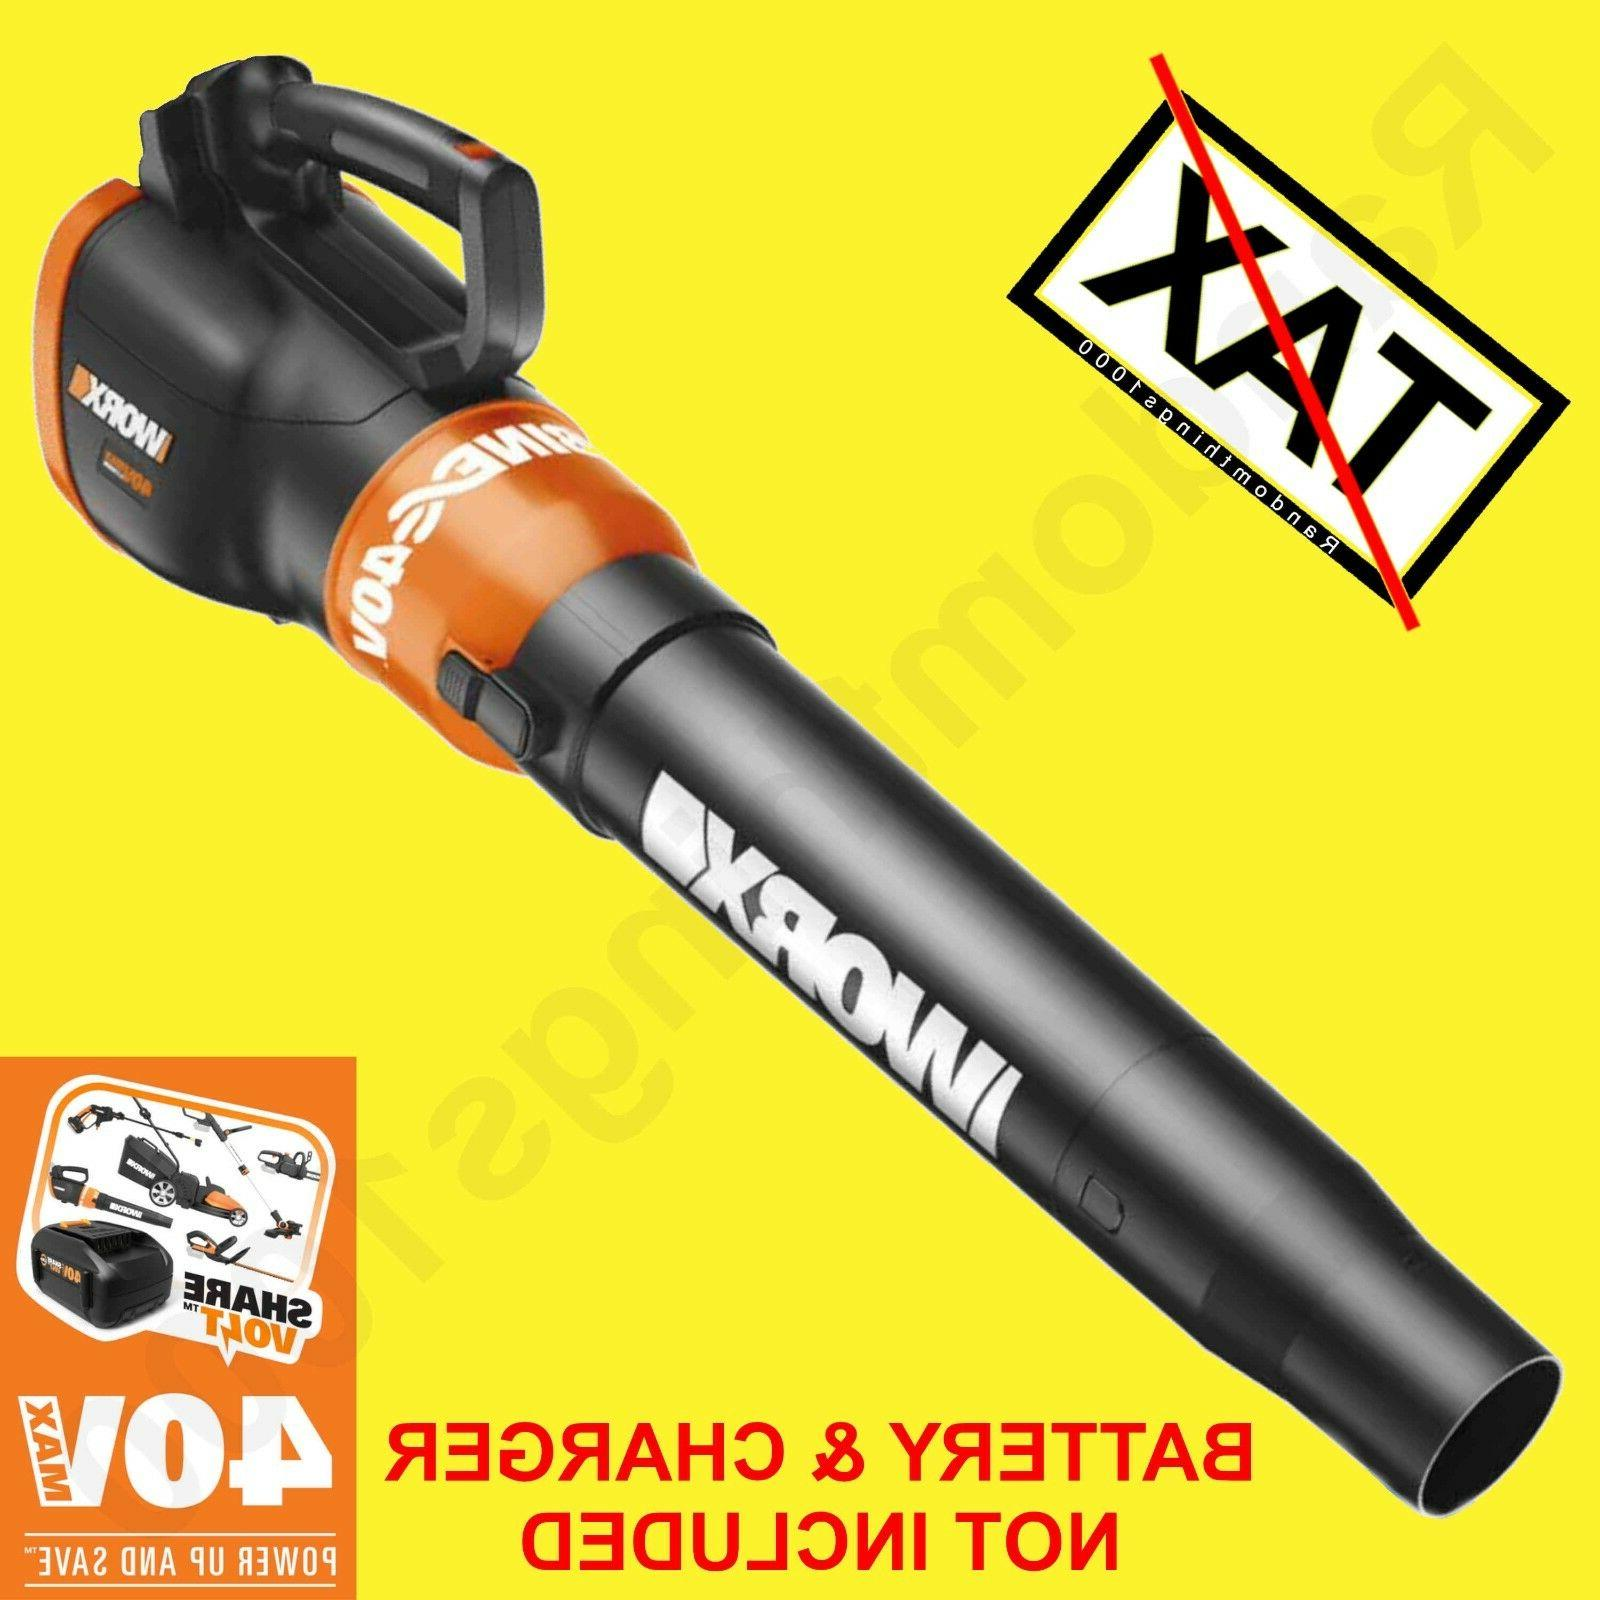 wg580 40v cordless leaf snow blower tool